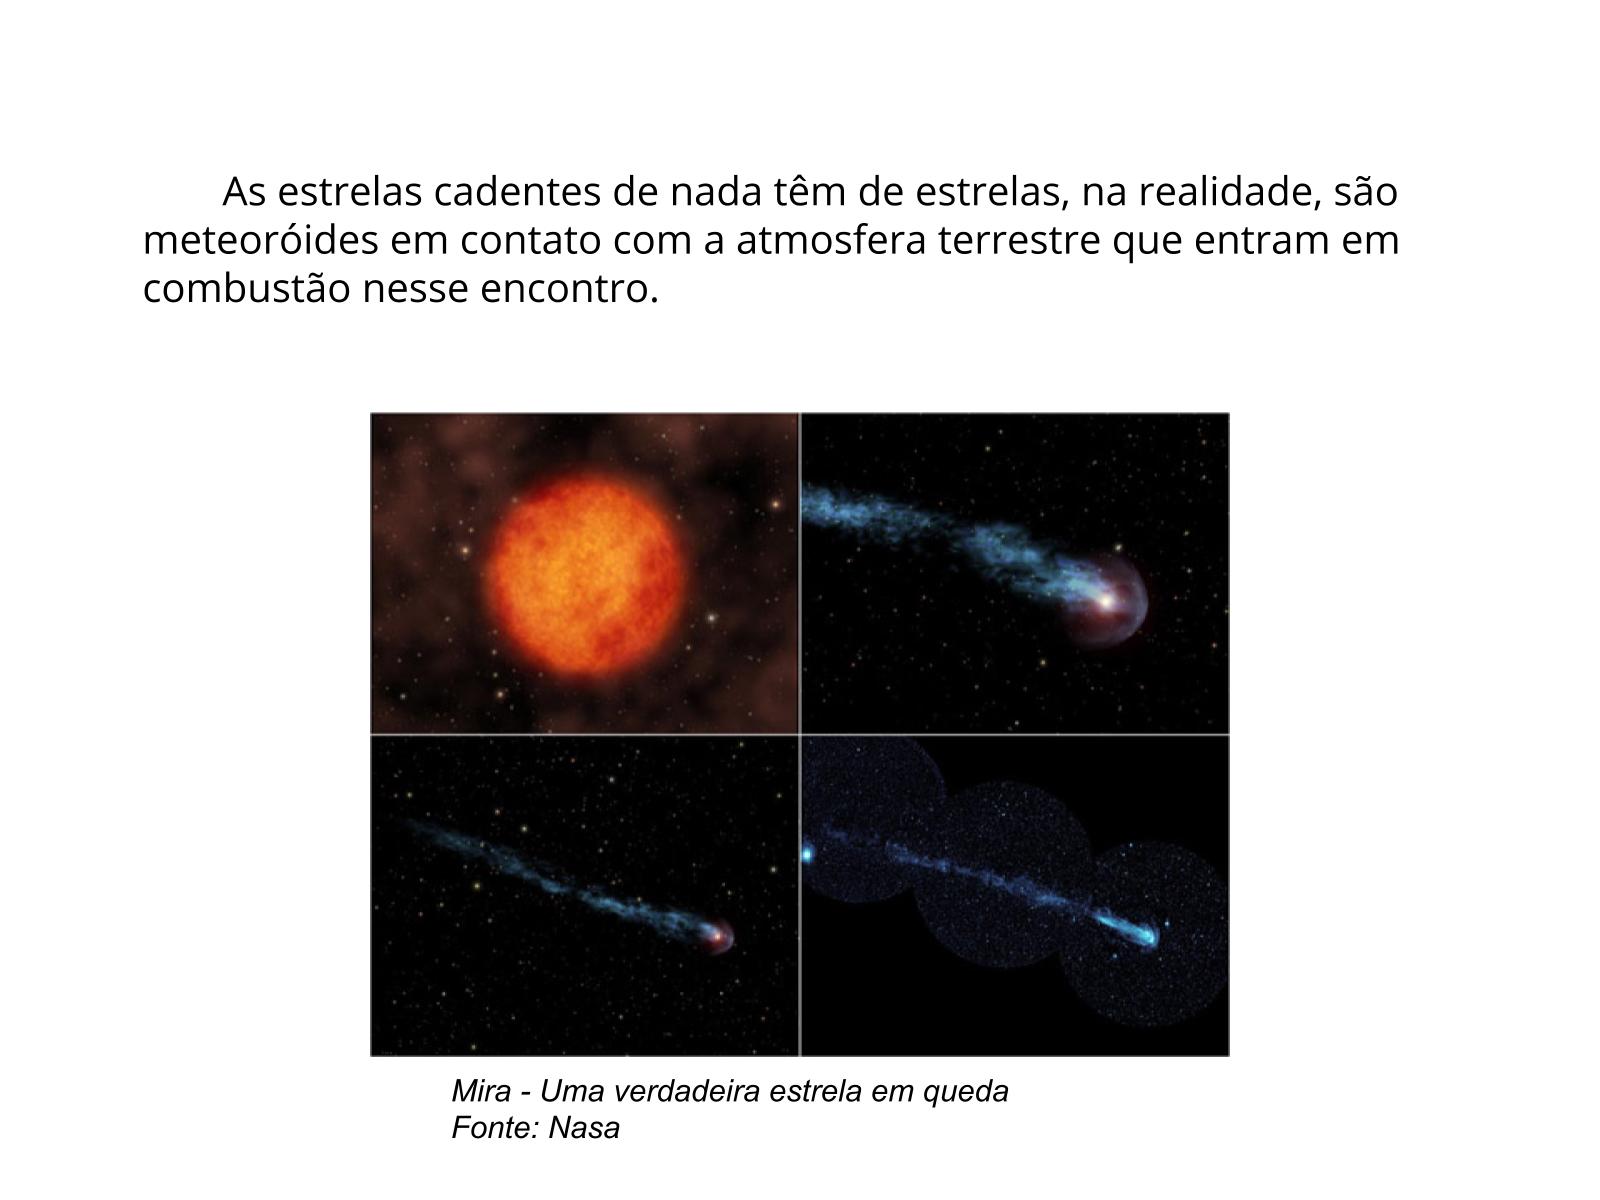 Desmistificando as estrelas cadentes